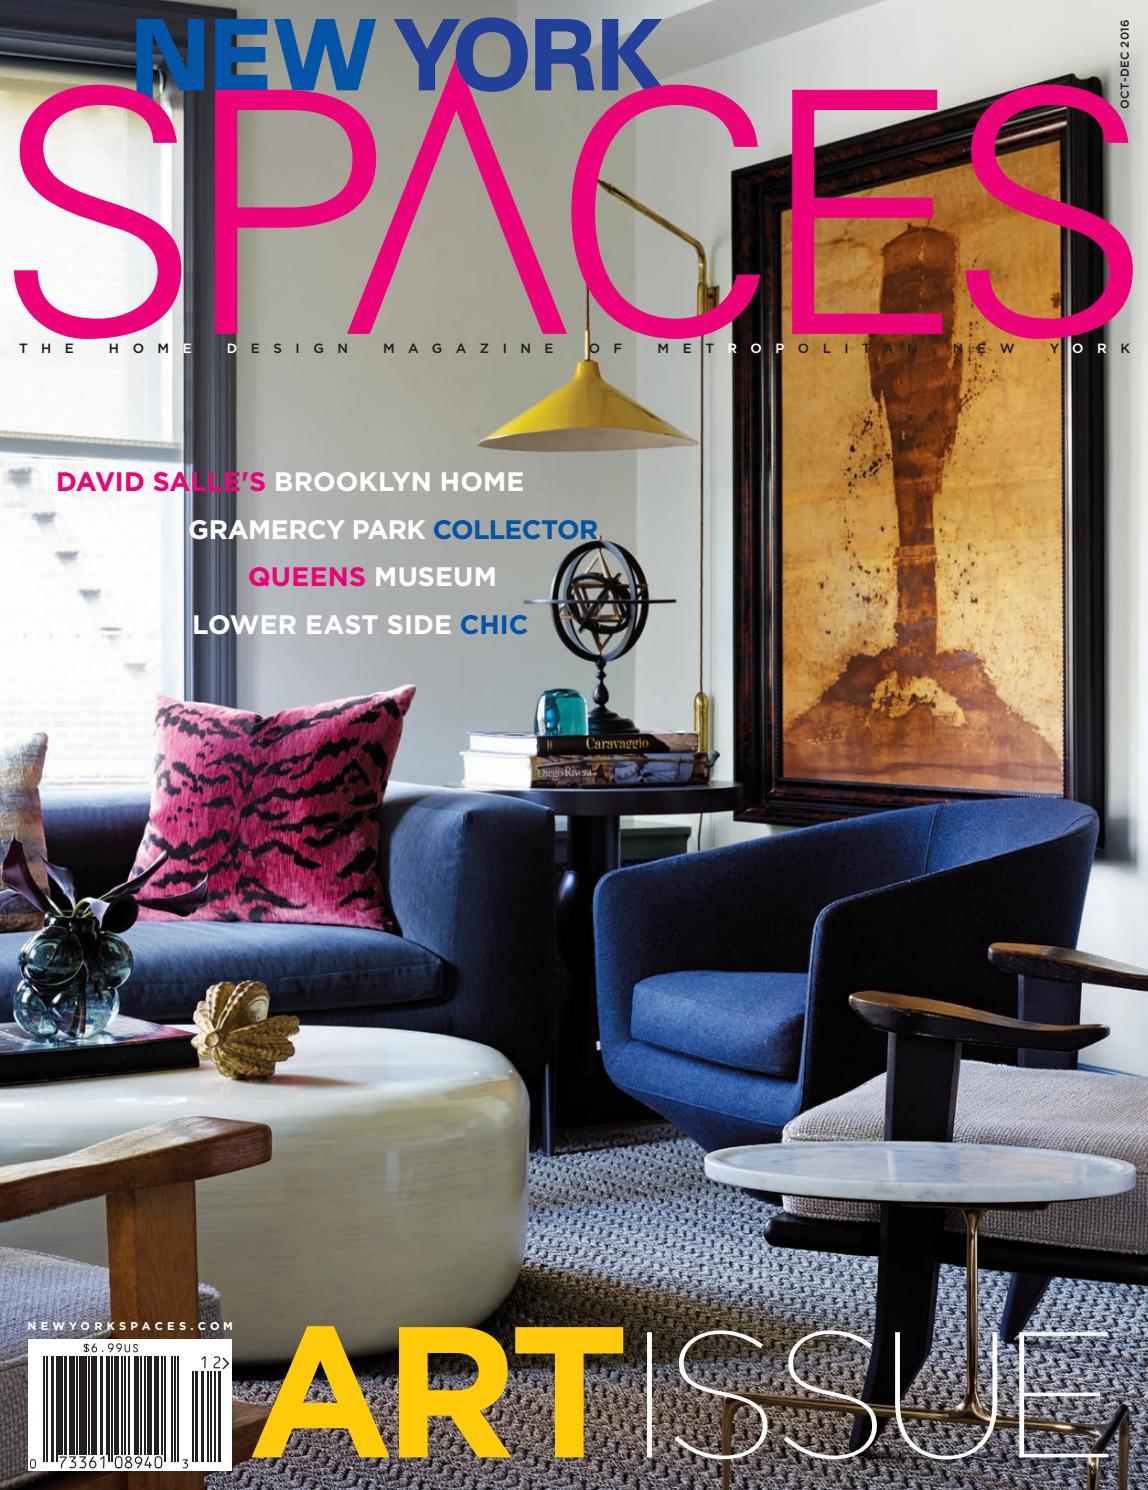 Meridienne Moderne Pour Salon new york spaces october-december 2016davler media - issuu